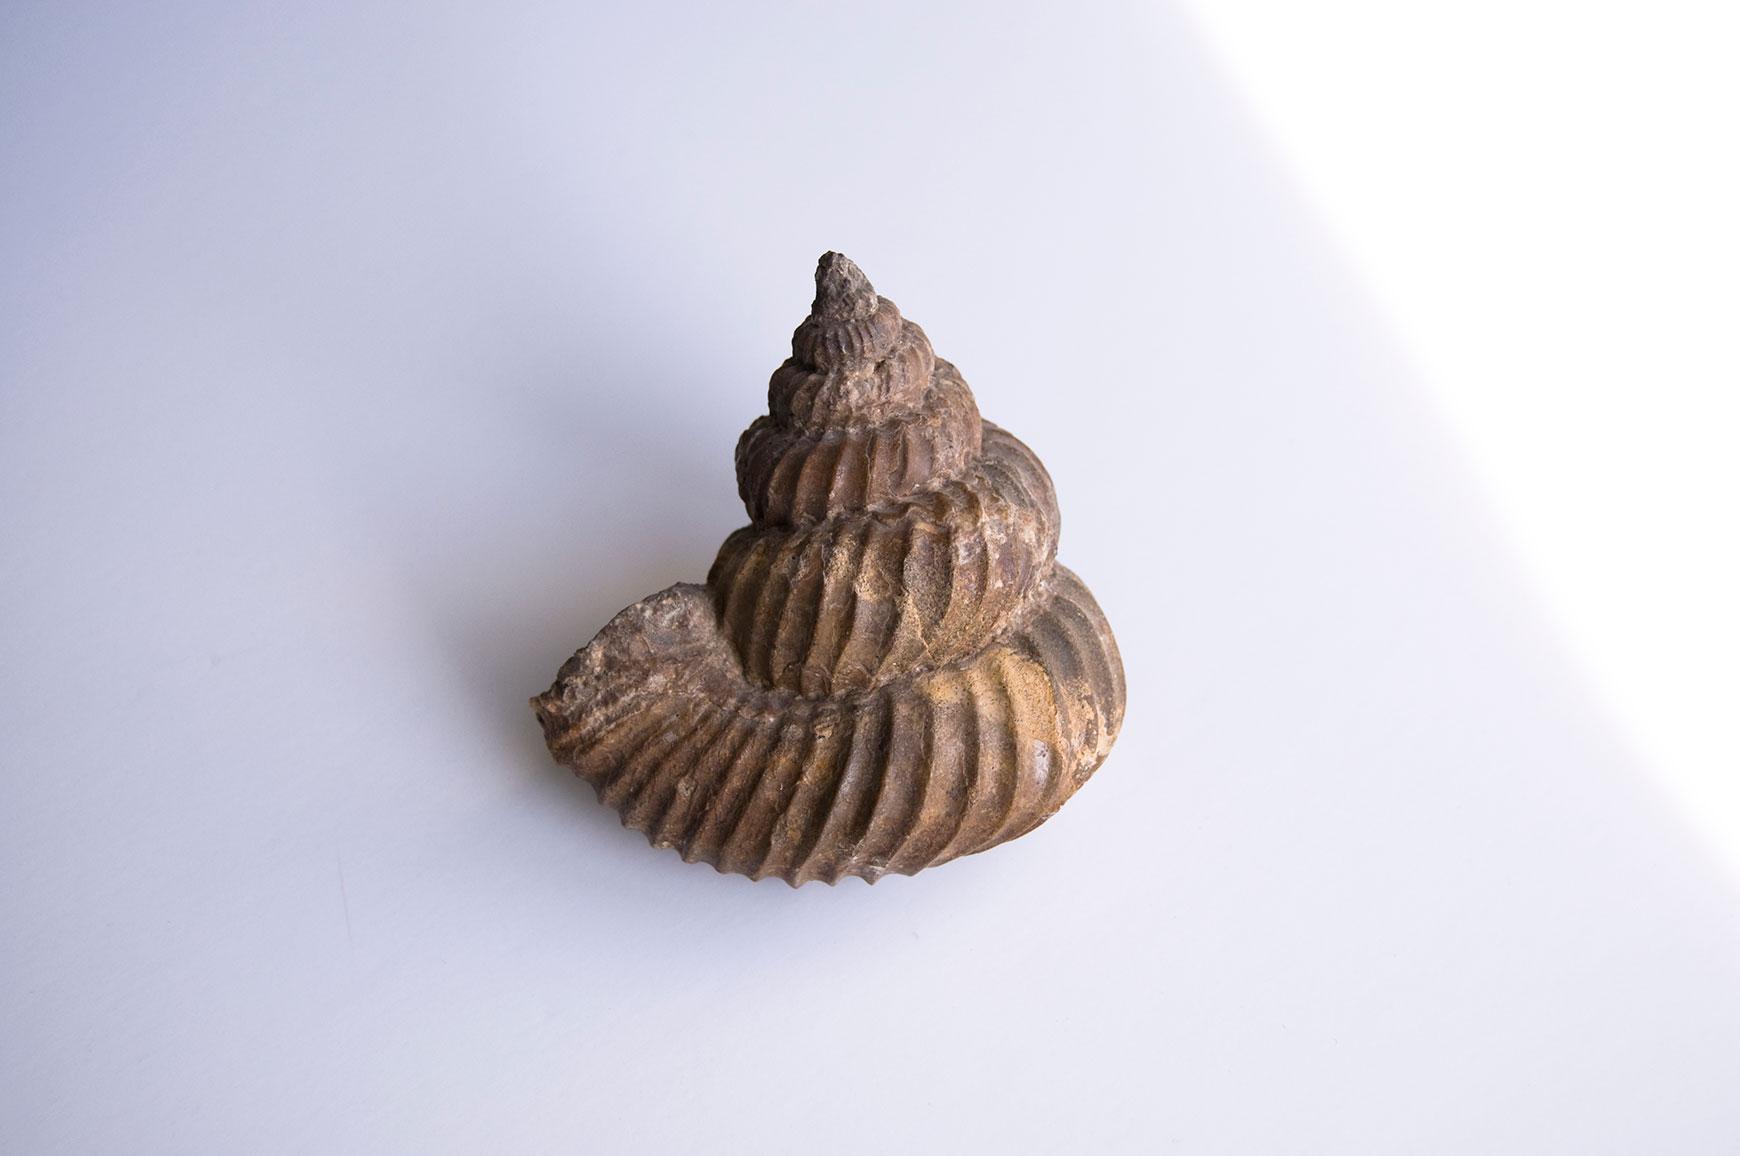 Eubostrychoceras matsumotoi